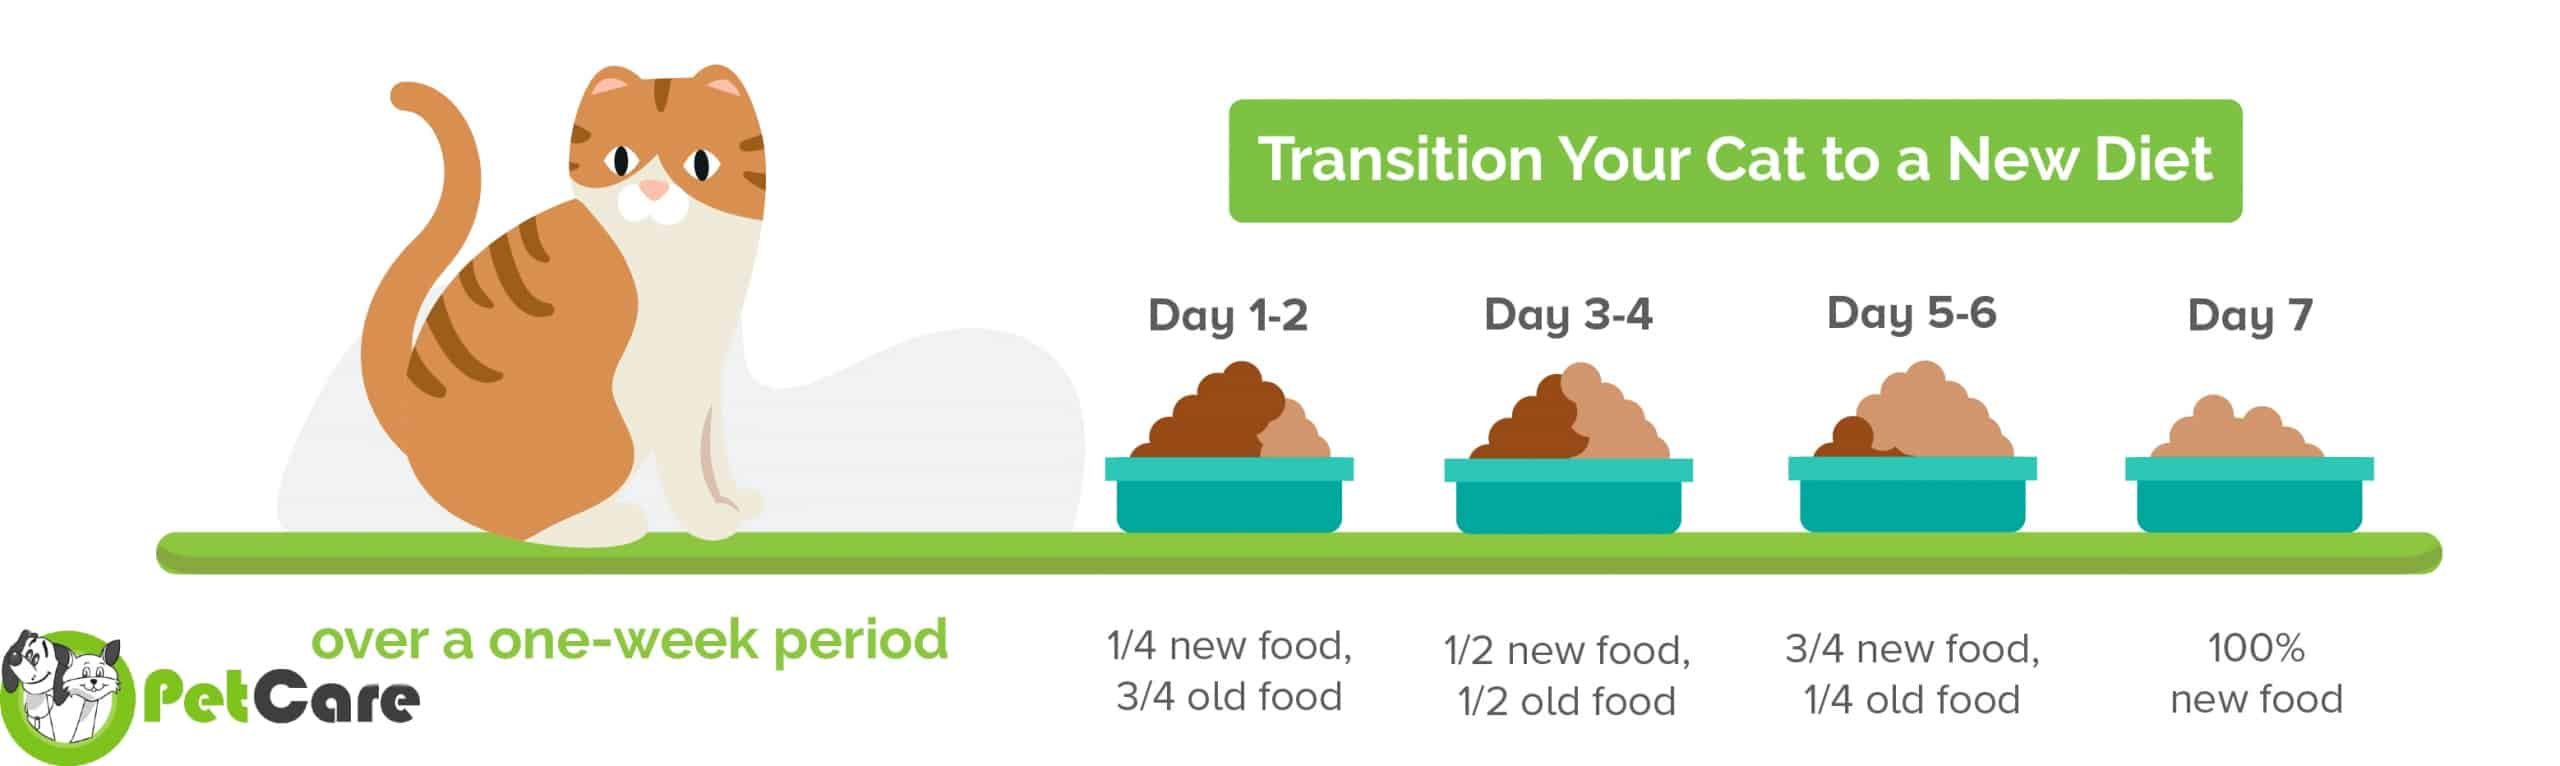 how to change cat diet